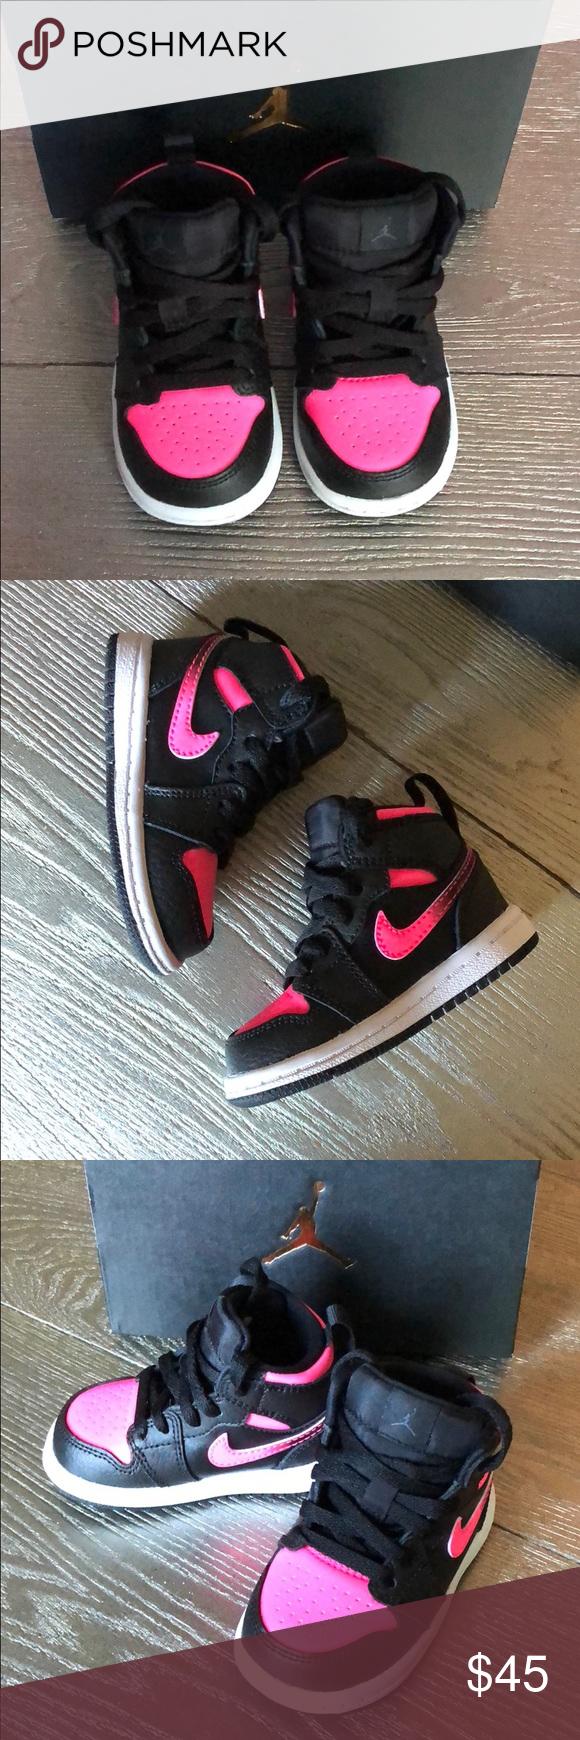 Baby Girl Jordan 1 Retro High Top 4c Black/Pink Black and